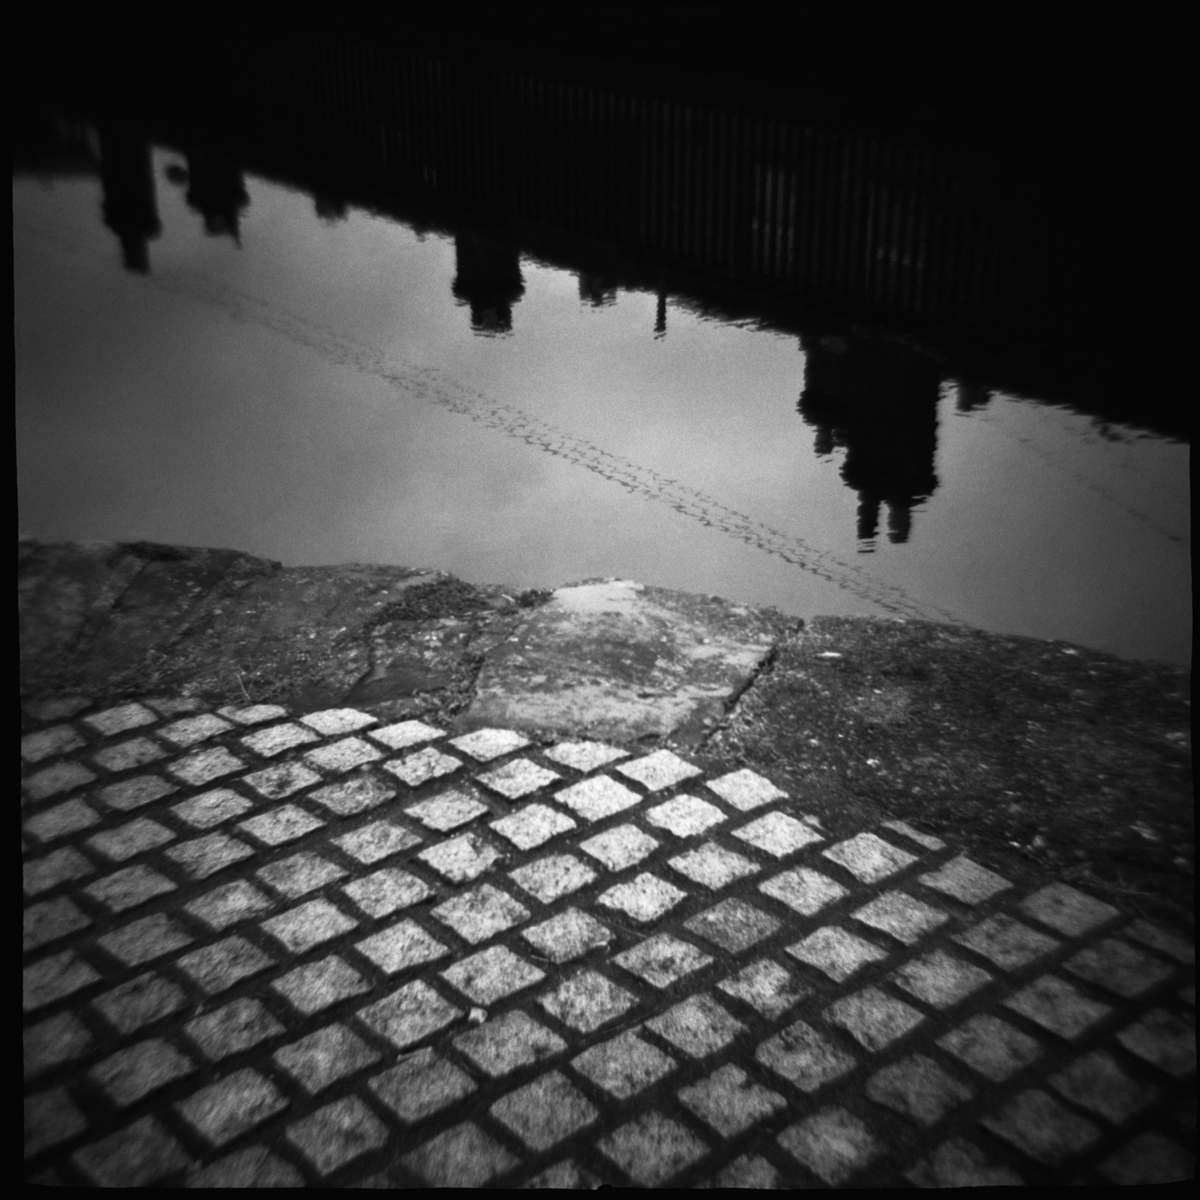 canal cobbles.jpg